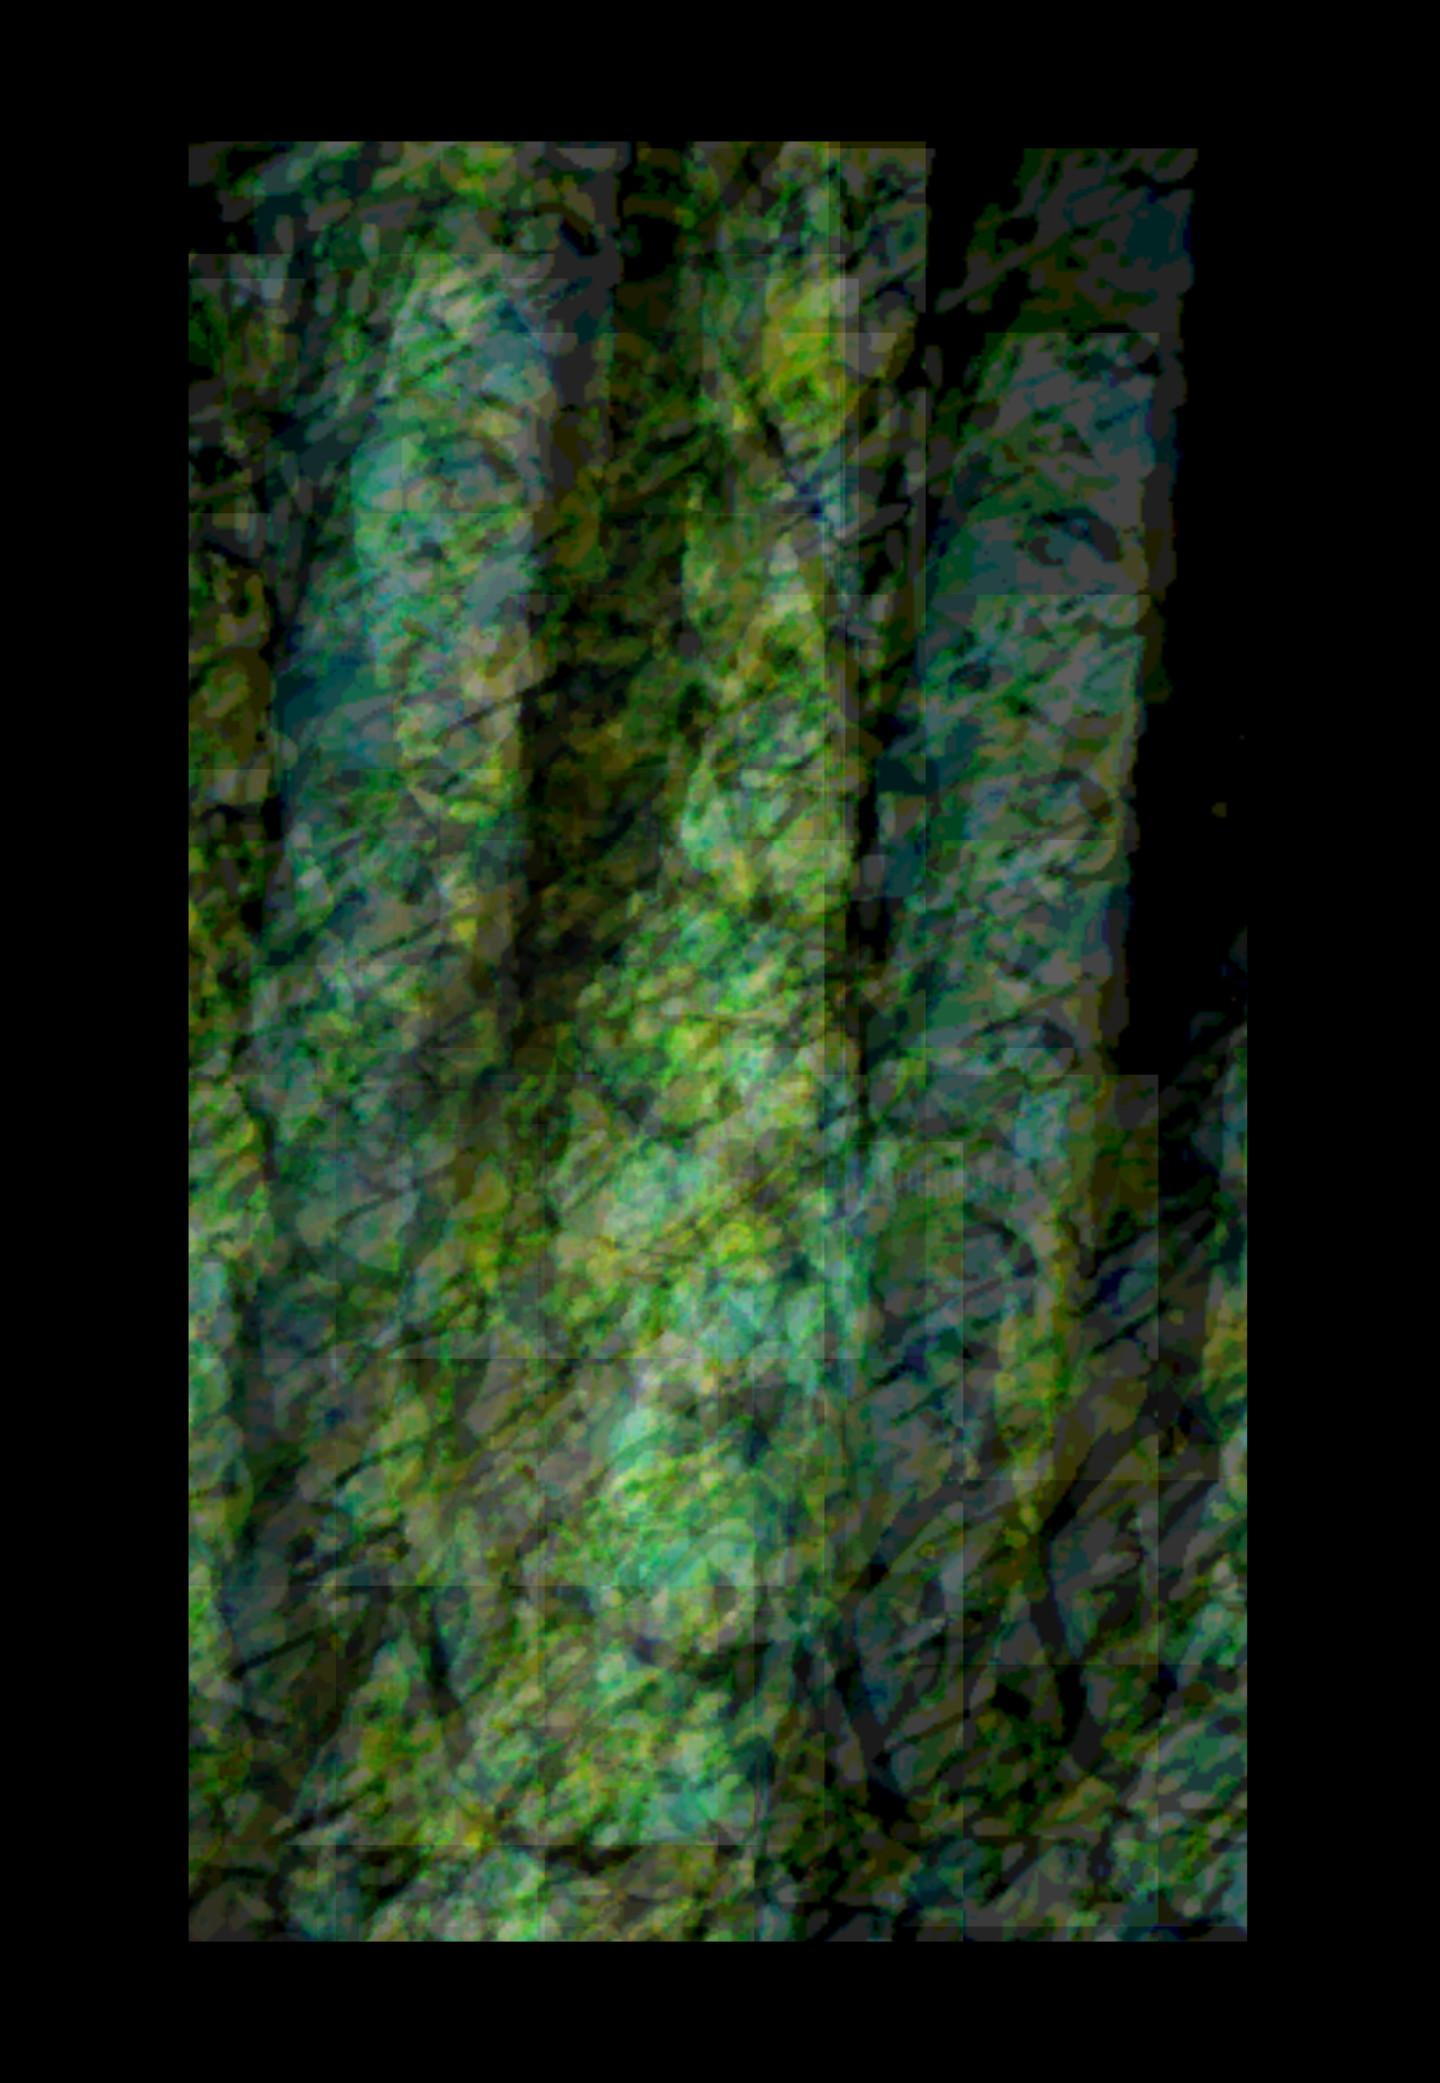 Gerald Shepherd - The Imaginary Curtain